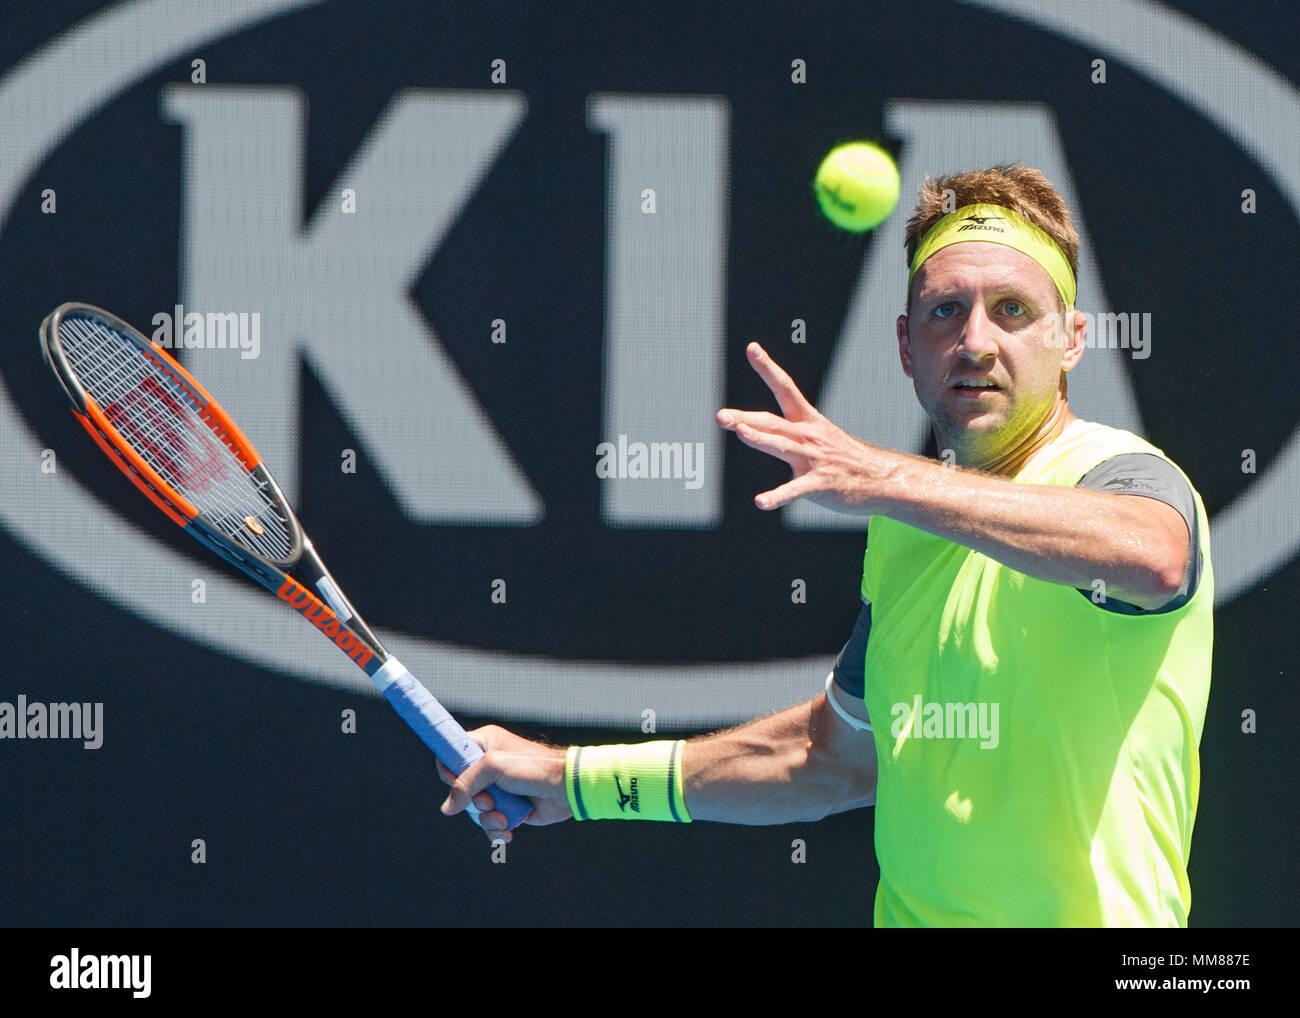 bce4498aab Tenista estadounidense Tennys Sandgren jugando forehand shot en el Abierto  de Australia 2018